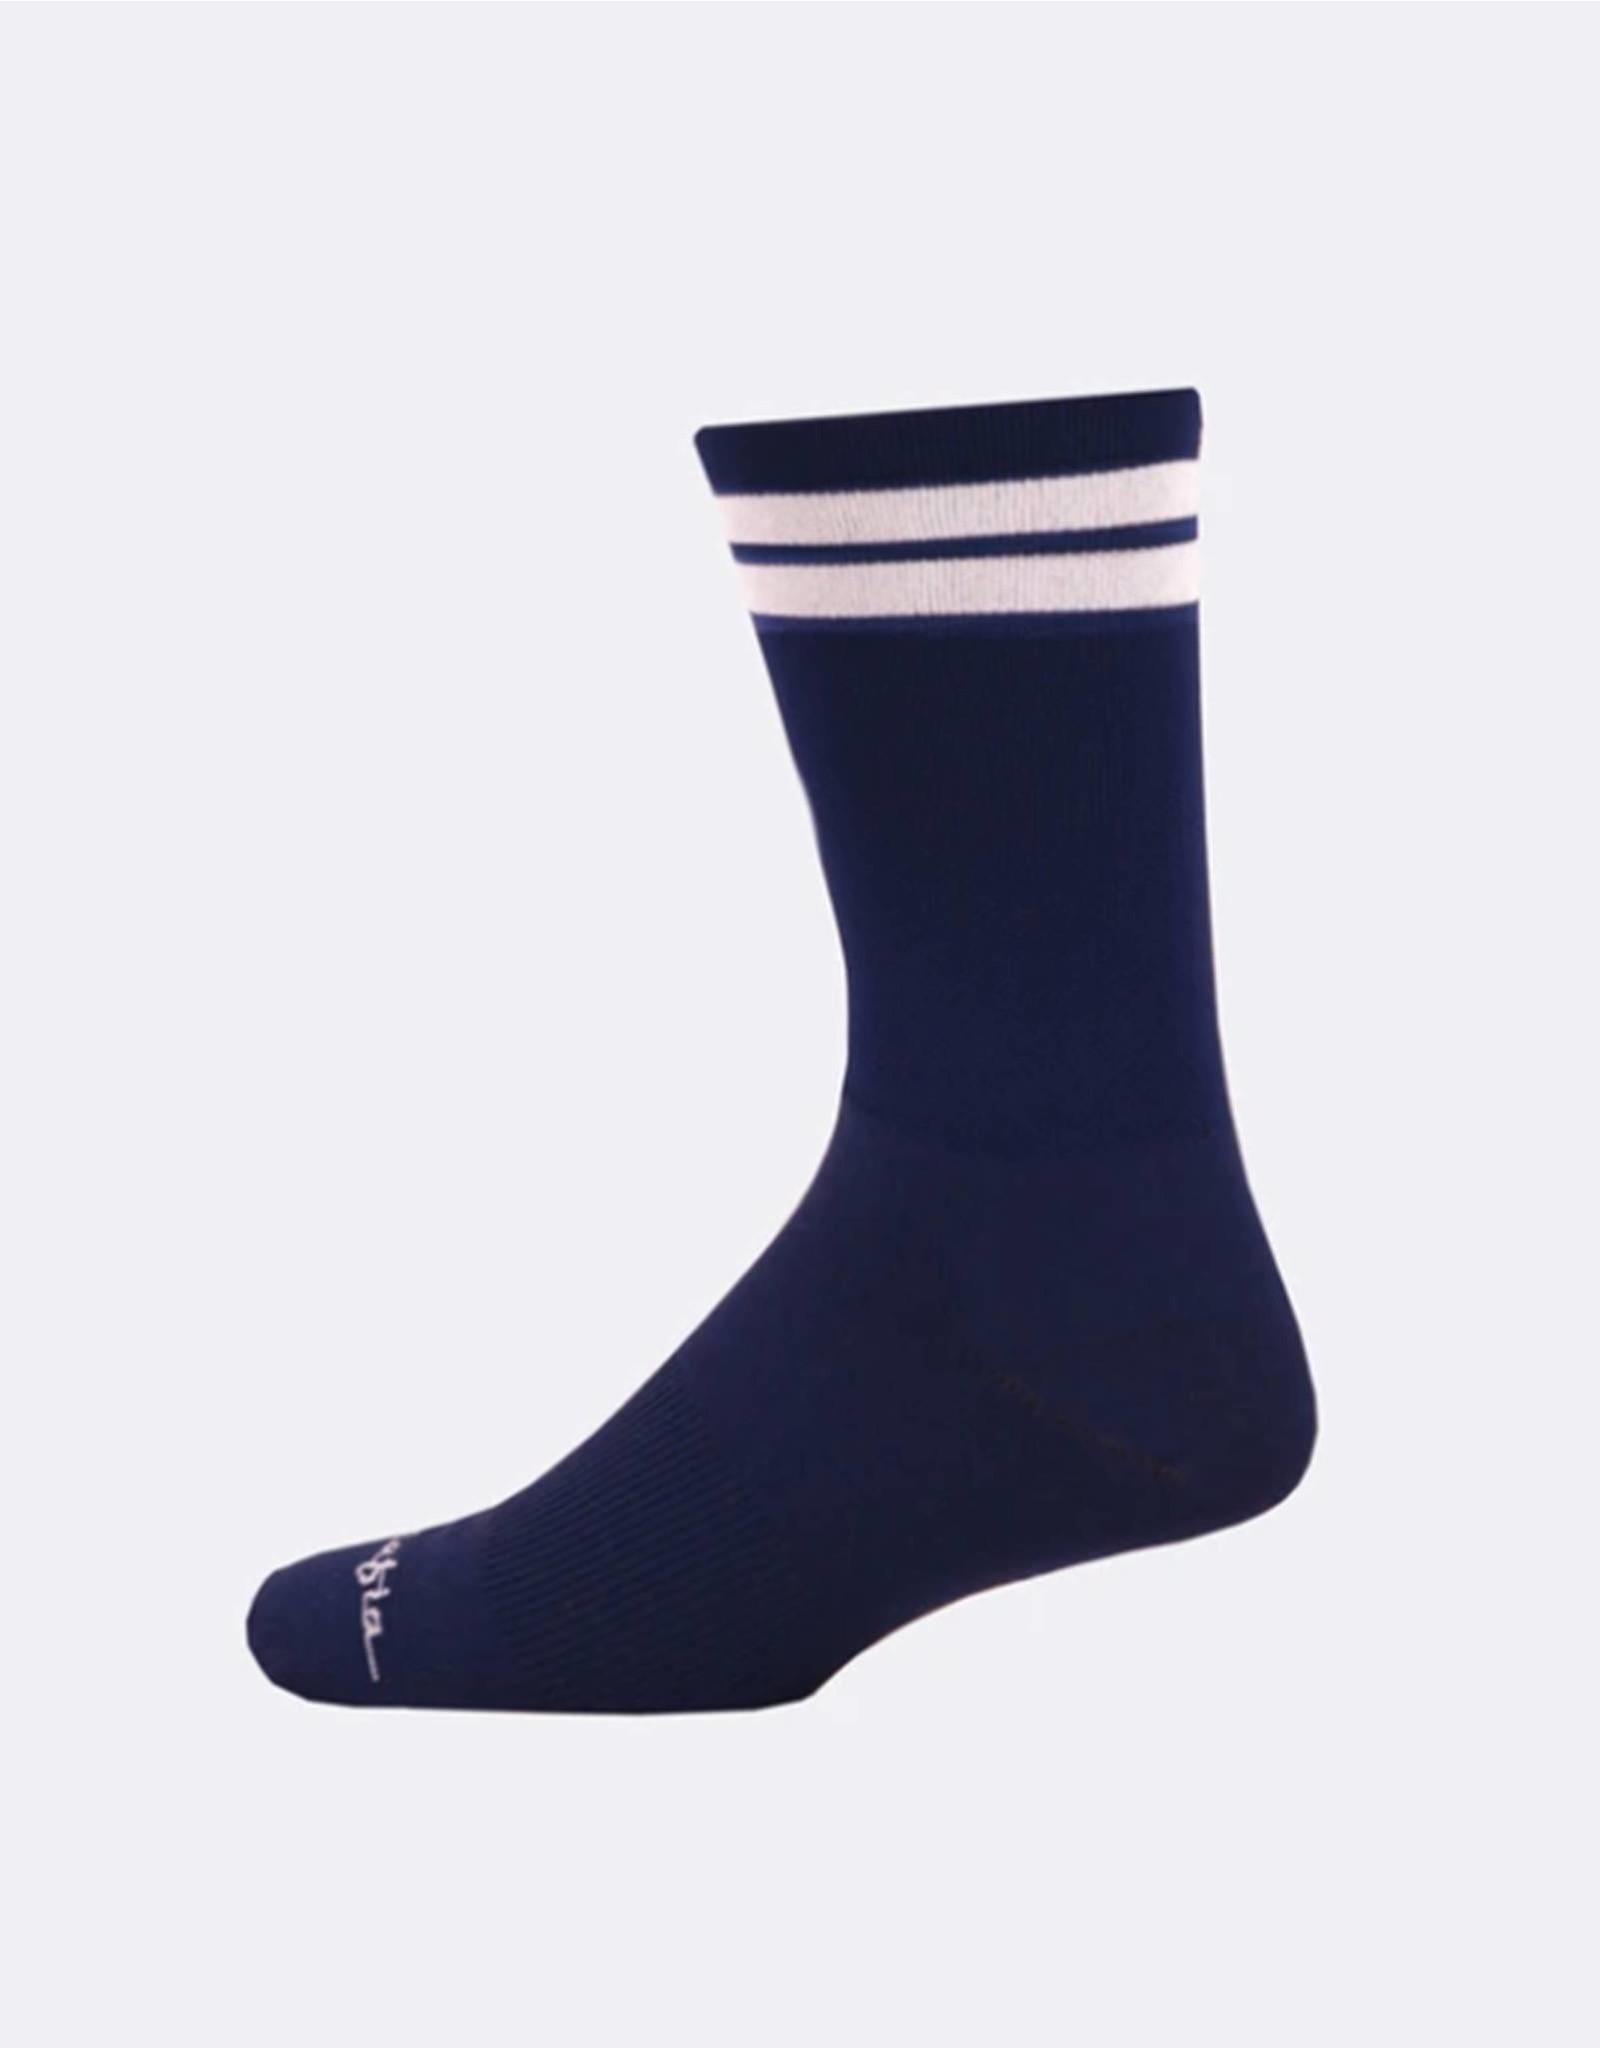 Pedal Mafia Core Sock - Navy